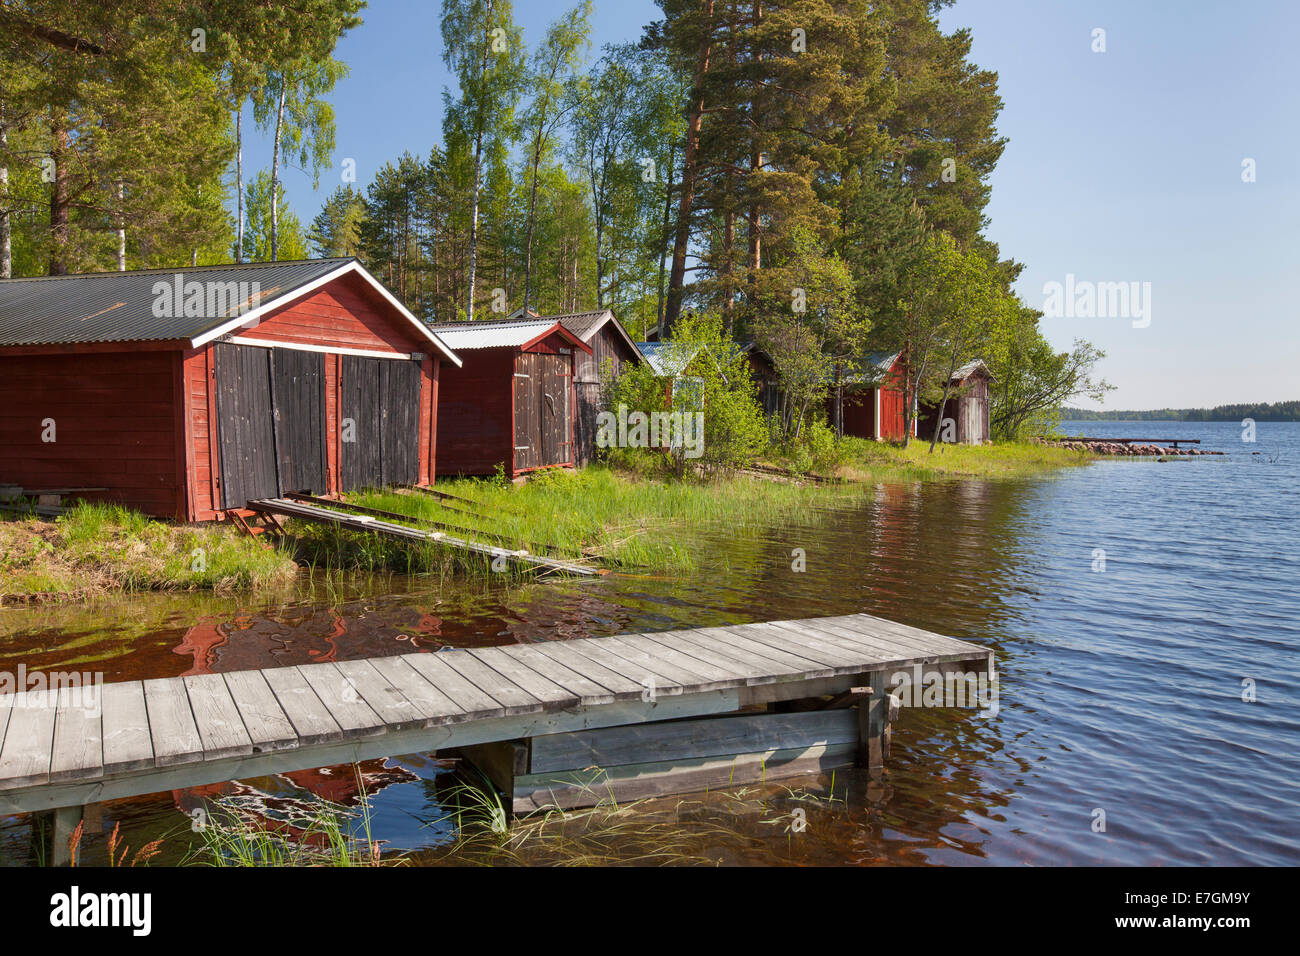 Red wooden boathouses along lake Siljan in summer, Dalarna, Sweden Stock Photo